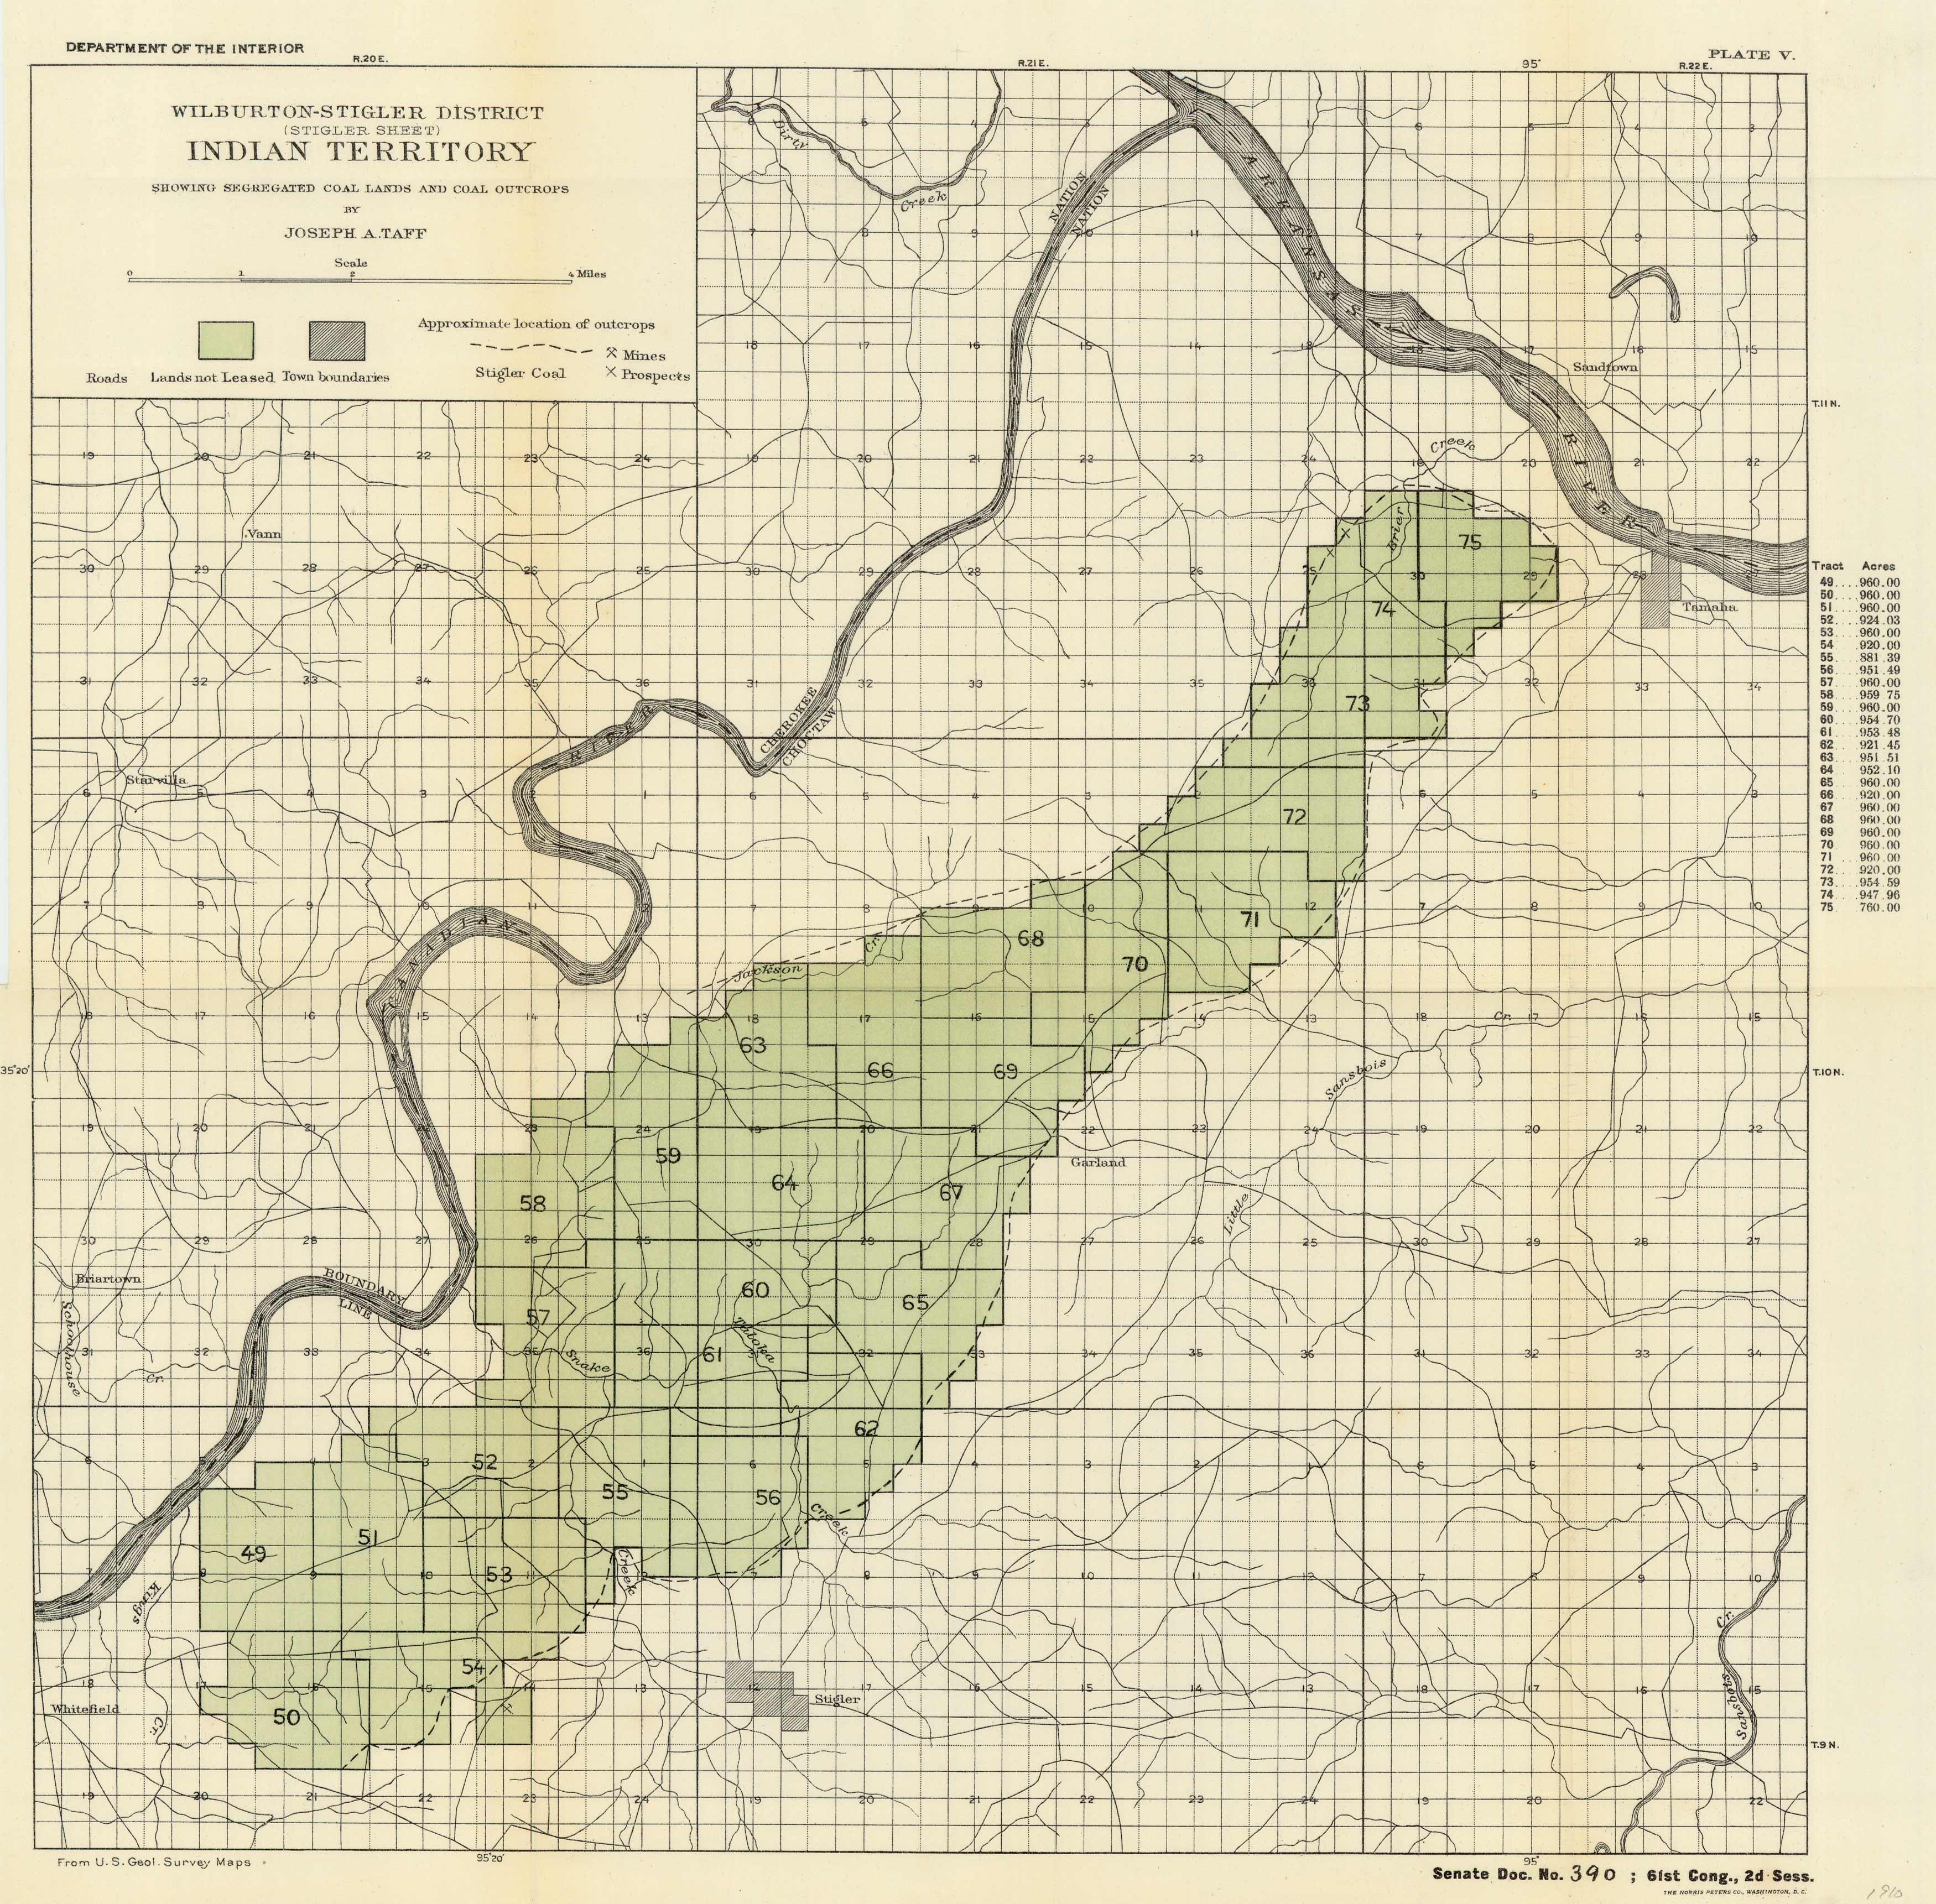 Wilburton-Stigler District (Stigler Sheet) - Indian Territory